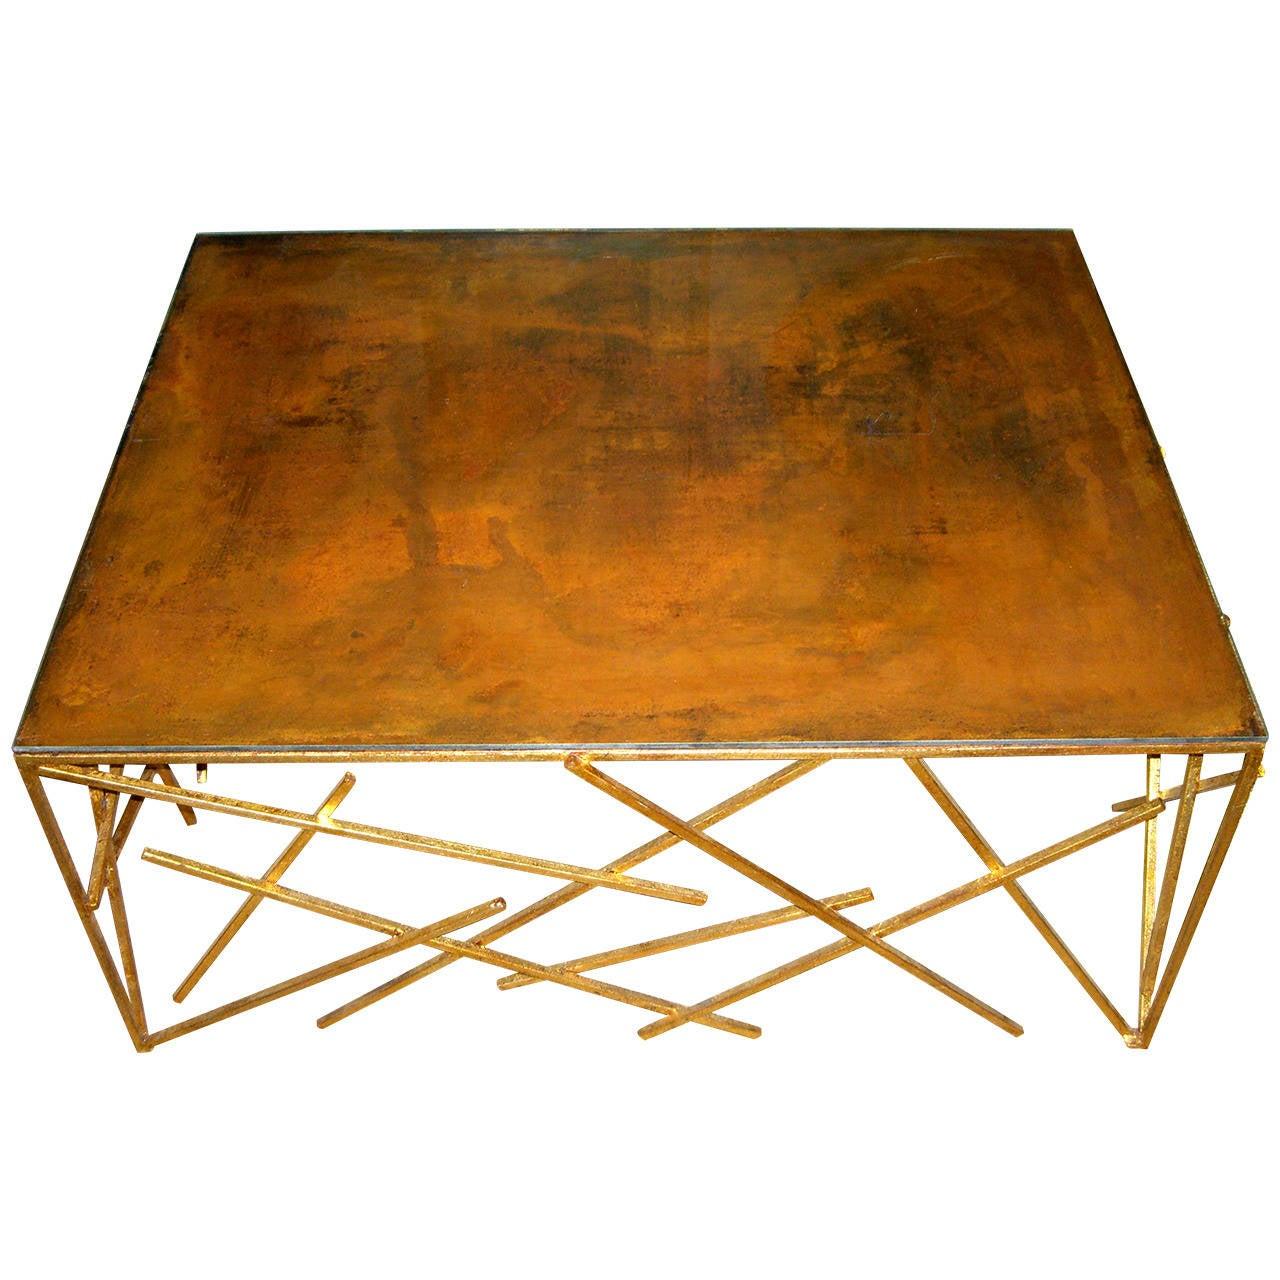 Custom Metal Criss-Cross Design Cocktail Table 1